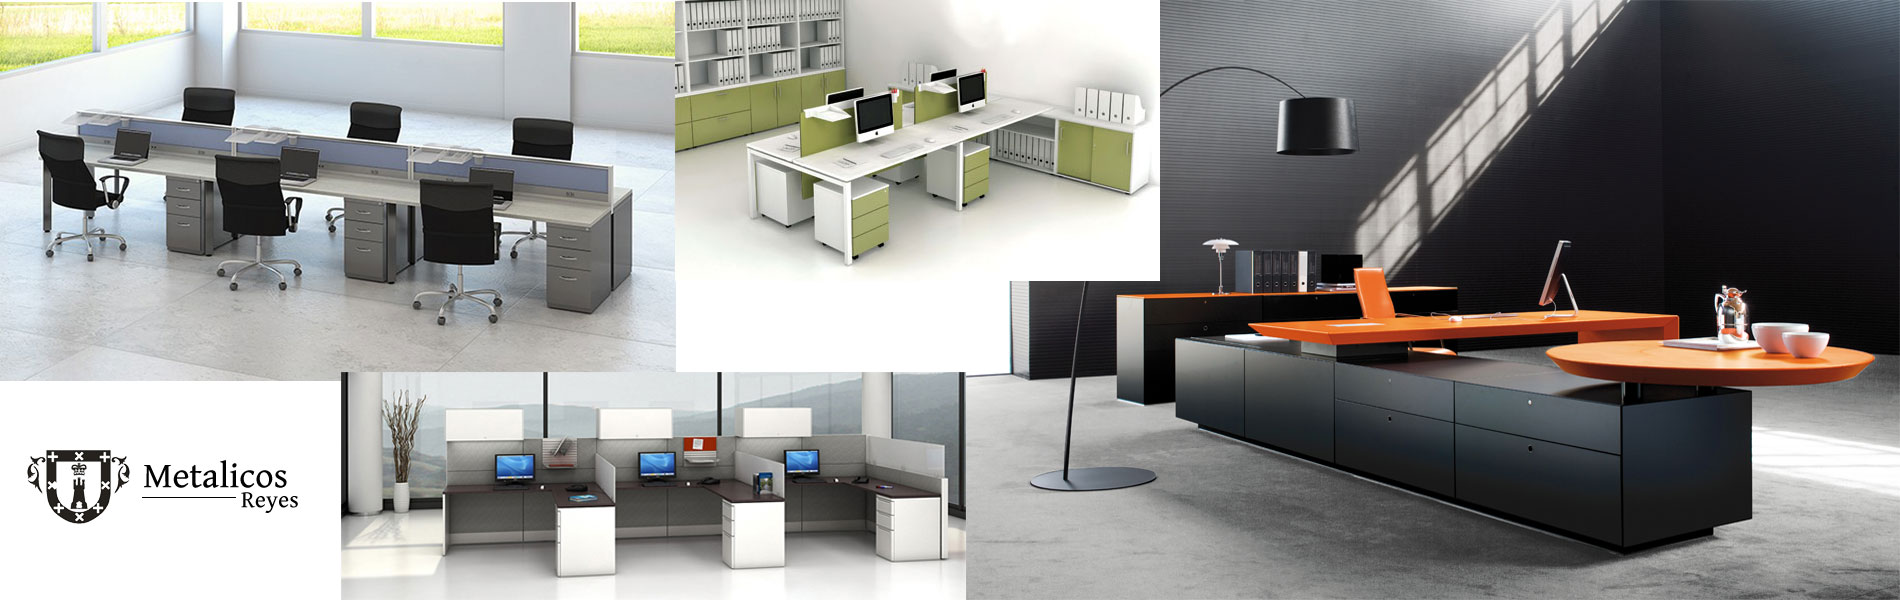 Muebles oficina tijuana for Proveedores de muebles de oficina